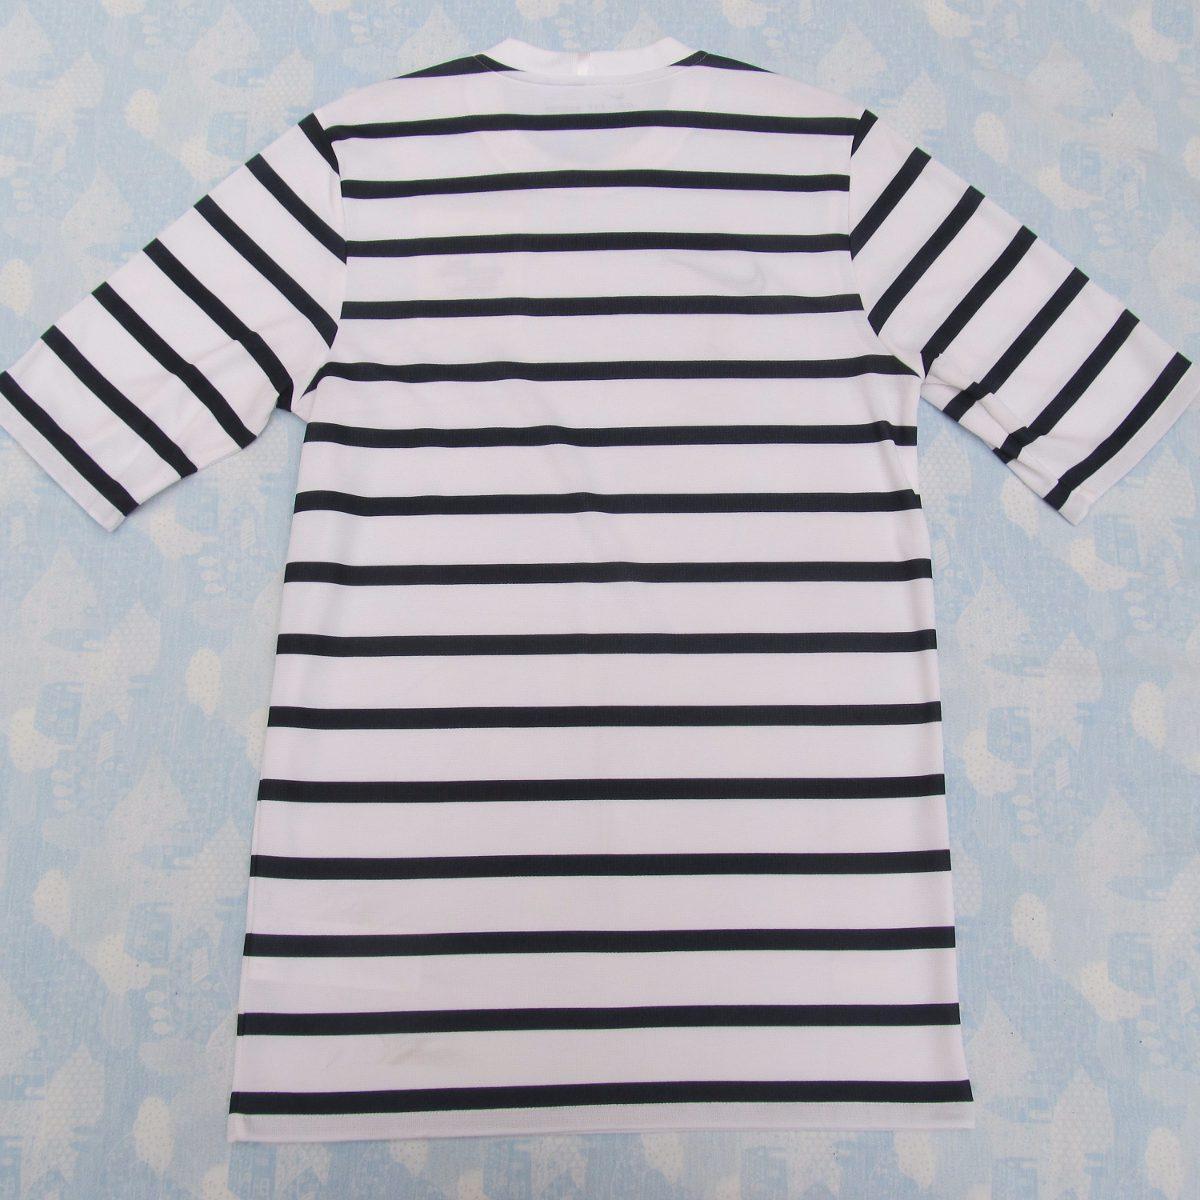 a263f47af7 ... camisa nike frança away 2011 p fn1608. Carregando zoom.